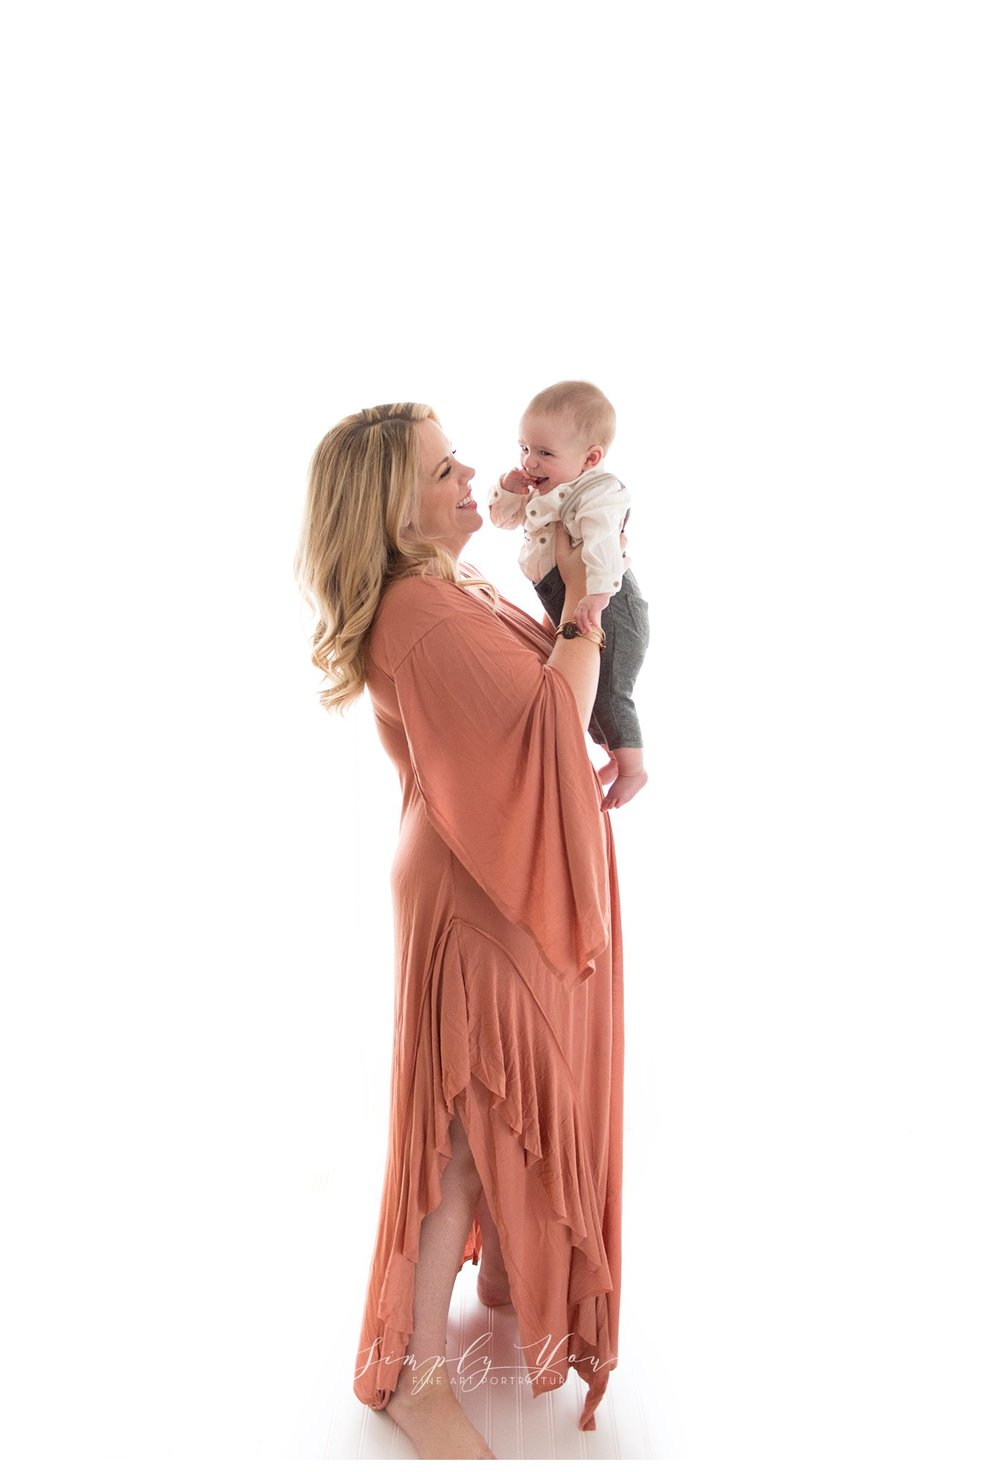 motherhoodlove